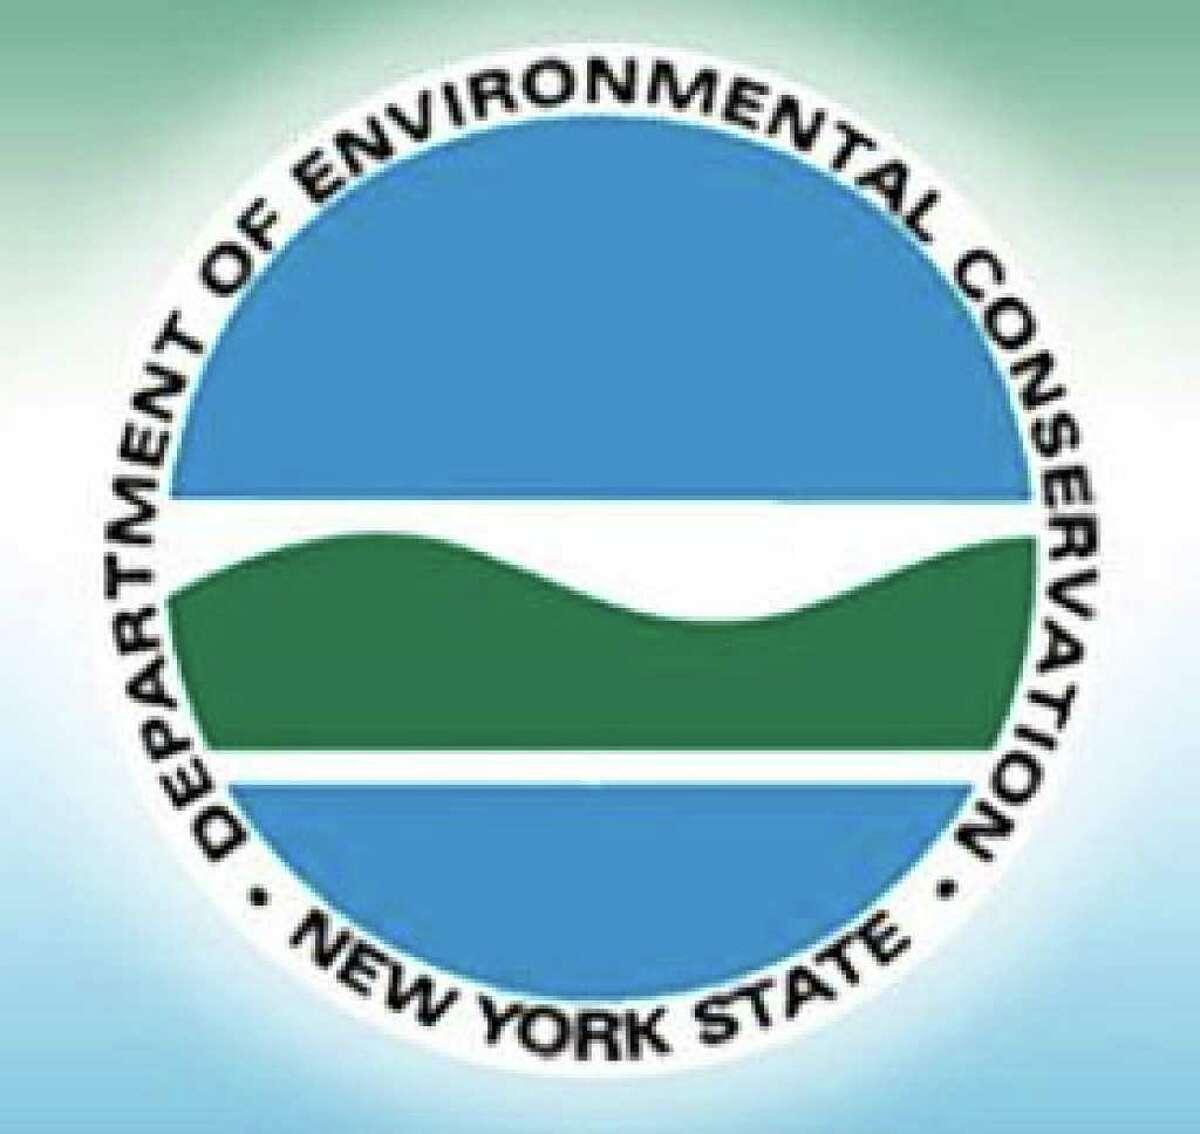 Department of Environmental Conservation logo.